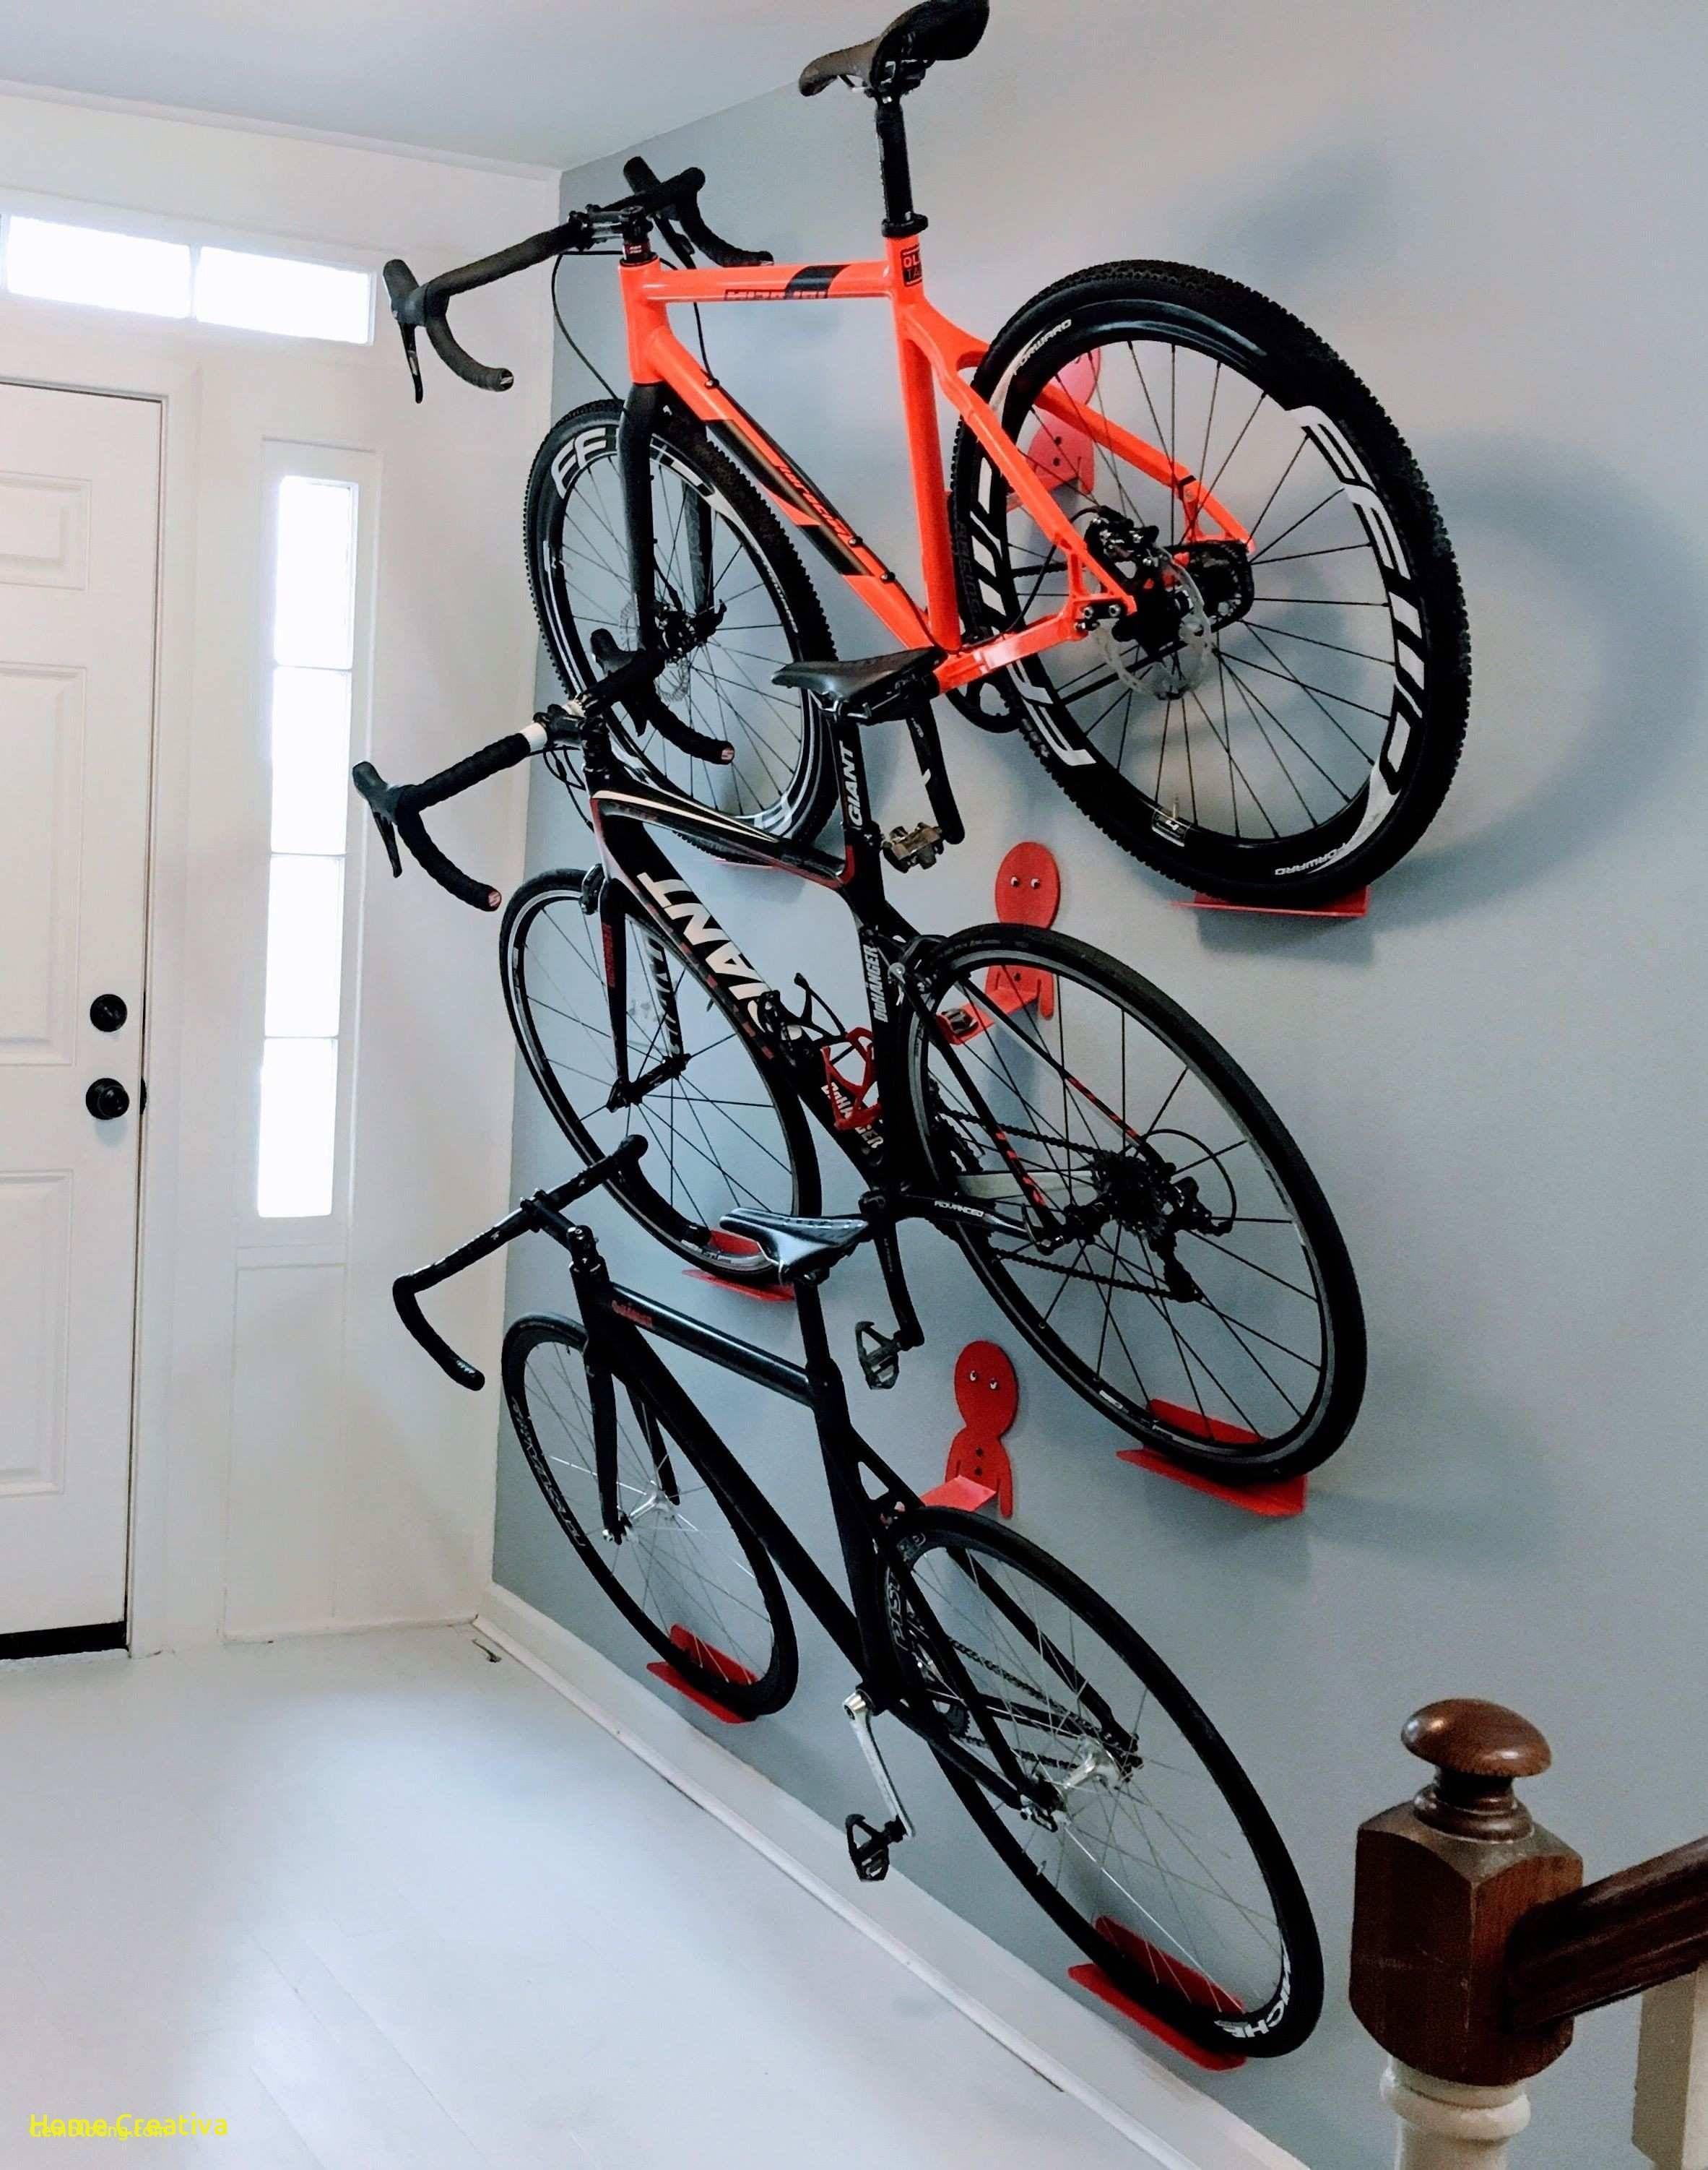 Diy Wall Mount Bike Repair Stand Rangement Velo Garage Accroche